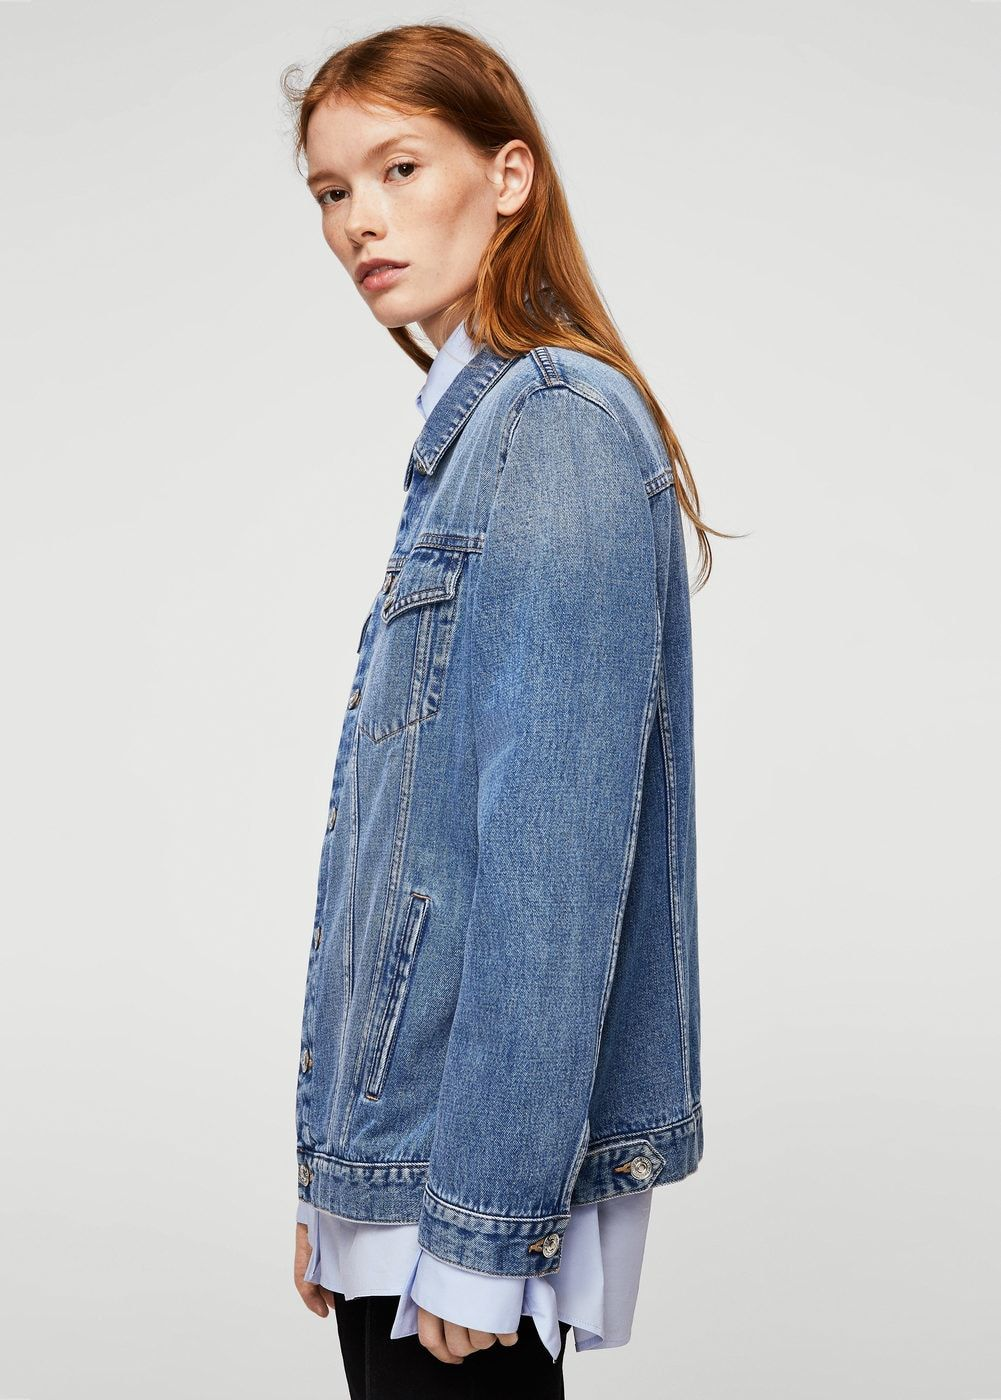 Medium wash denim jacket - Woman | MANGO United Kingdom